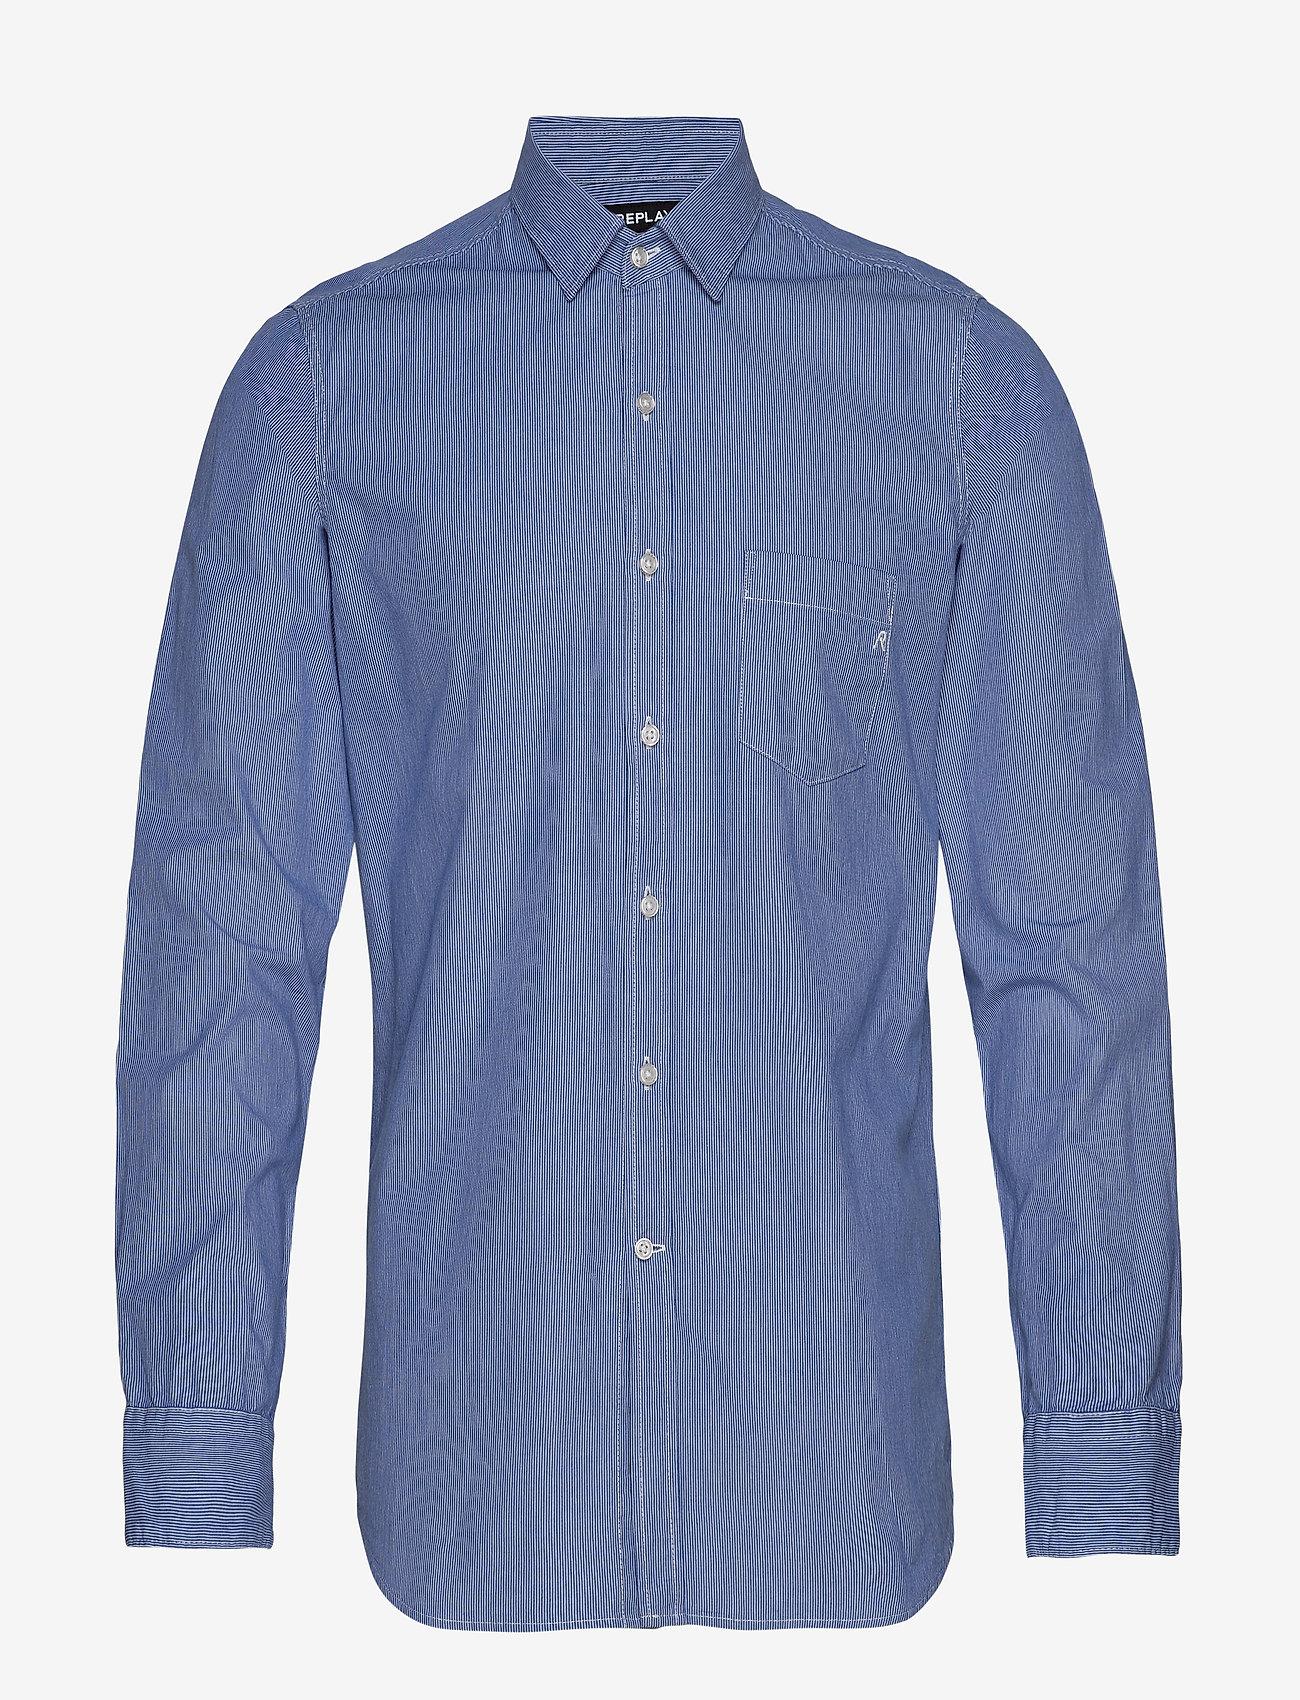 Replay Yarn Dyed Micro Striped Cotton - Skjortor Light Blue/white